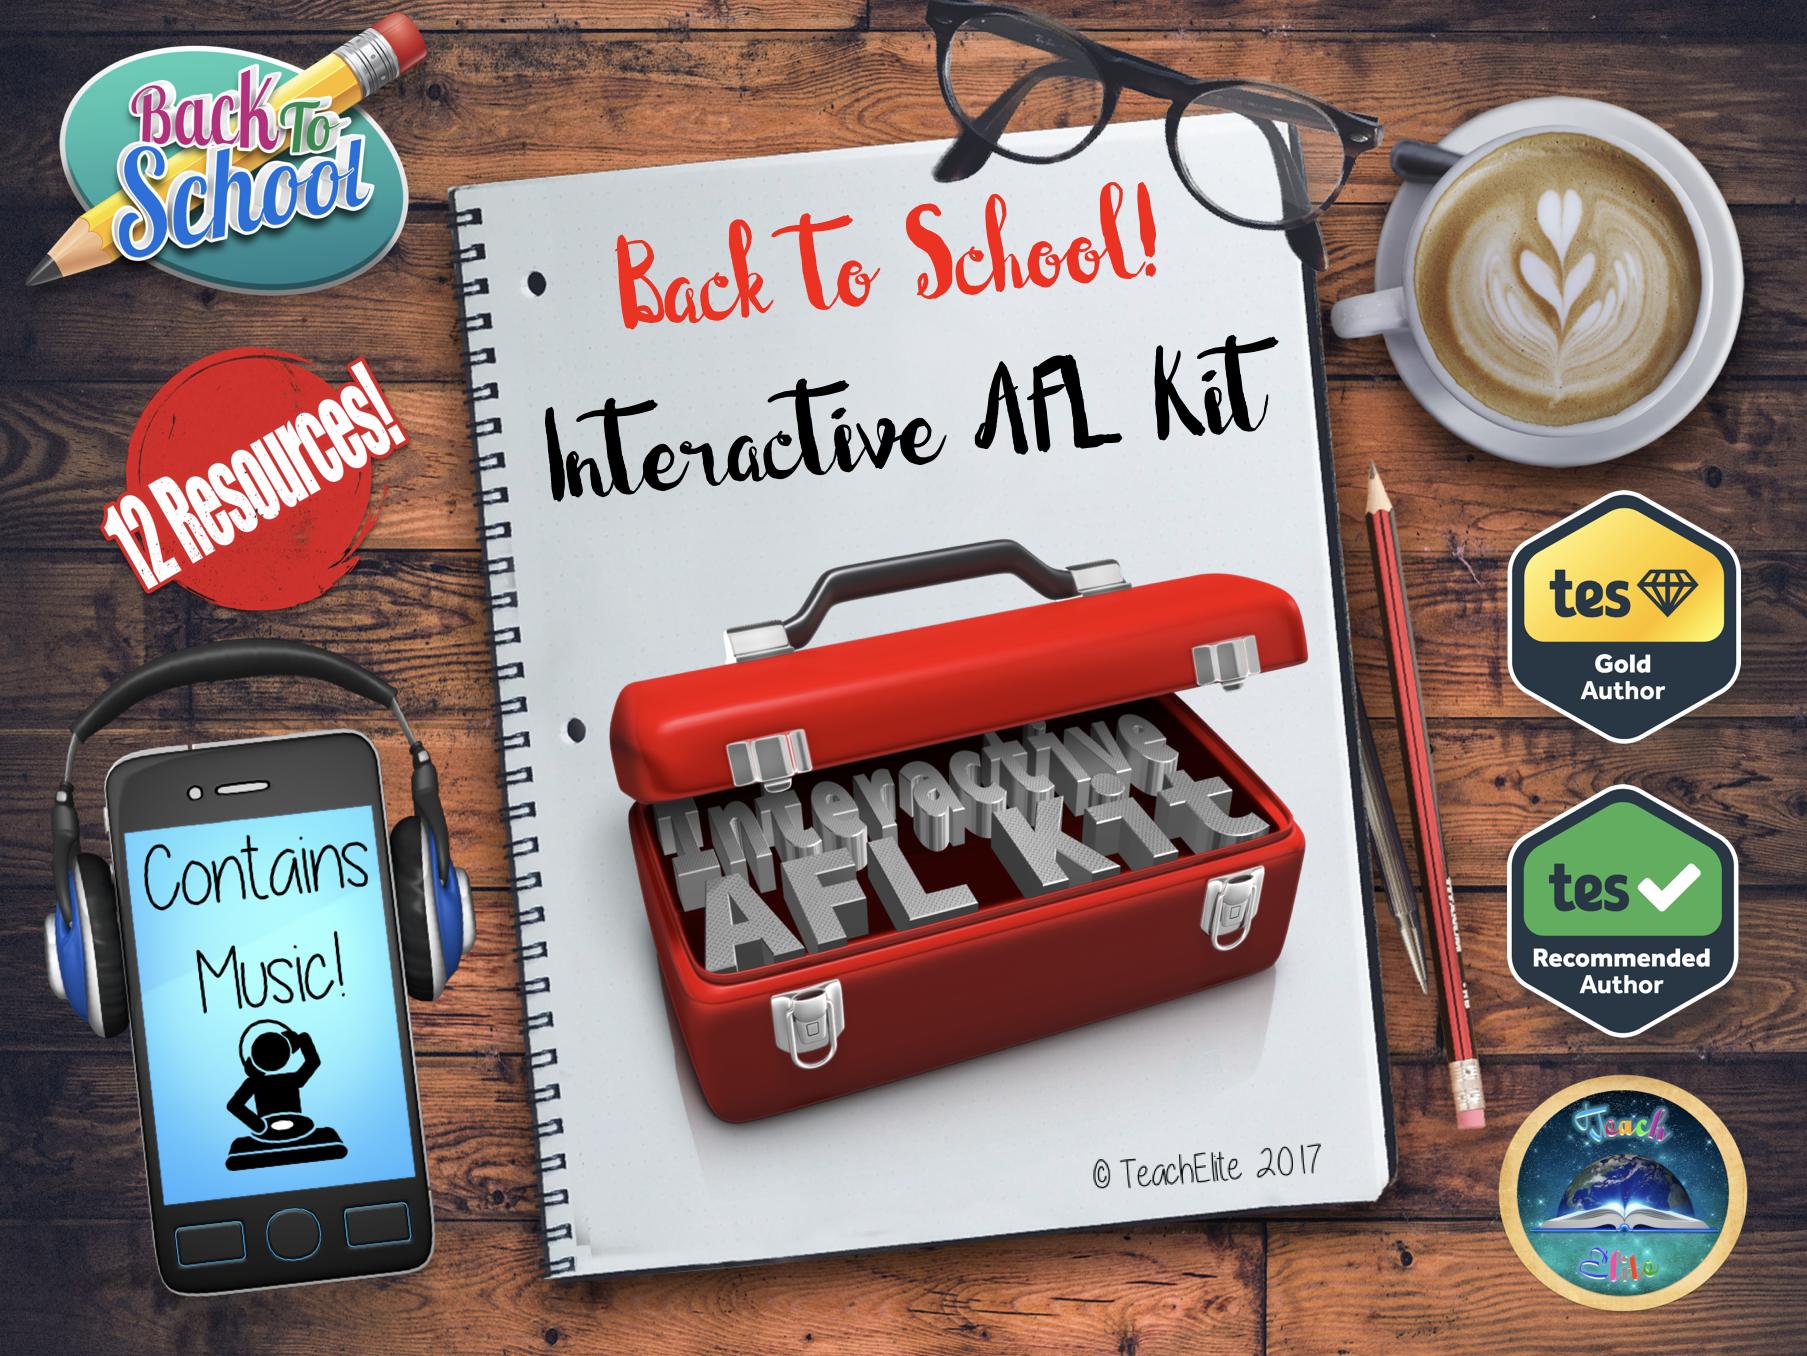 Back to school - Interactive AFL Kit Bundle